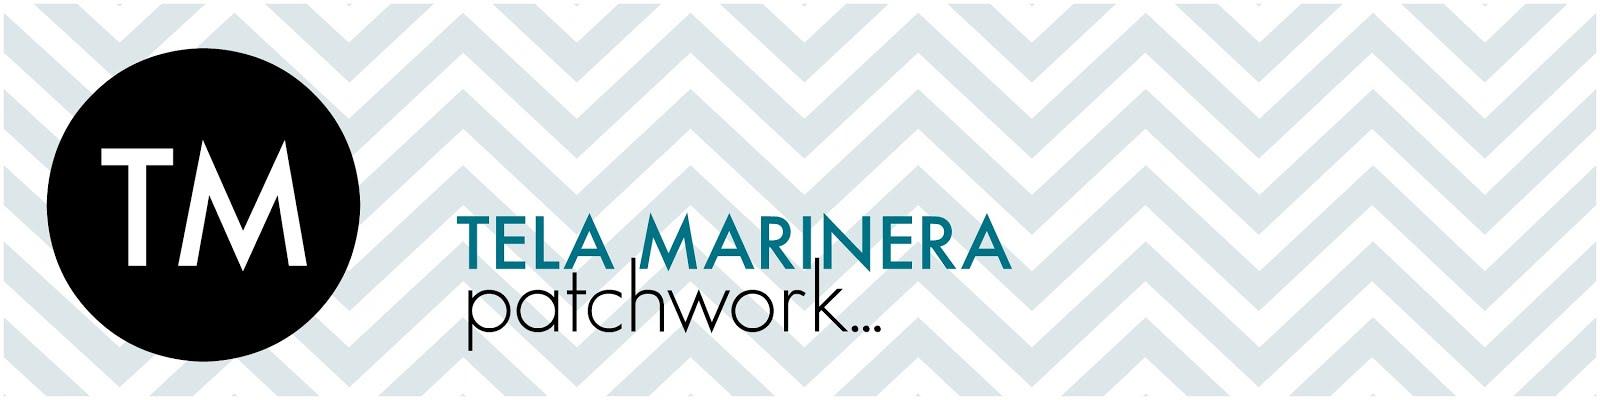 TELA MARINERA, Patchwork